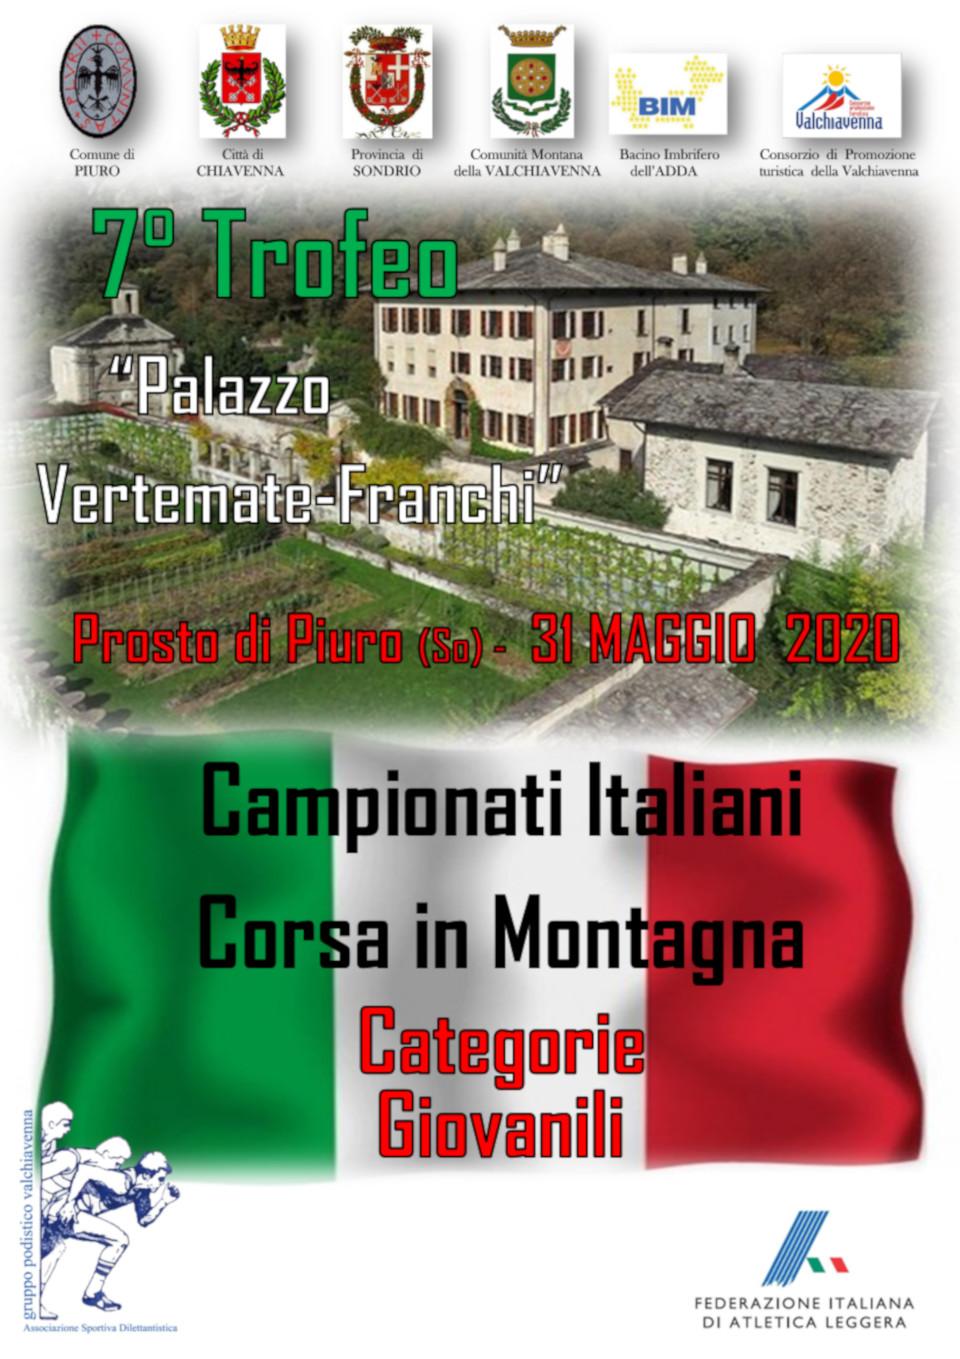 Trofeo Palazzo Vertemate Franchi